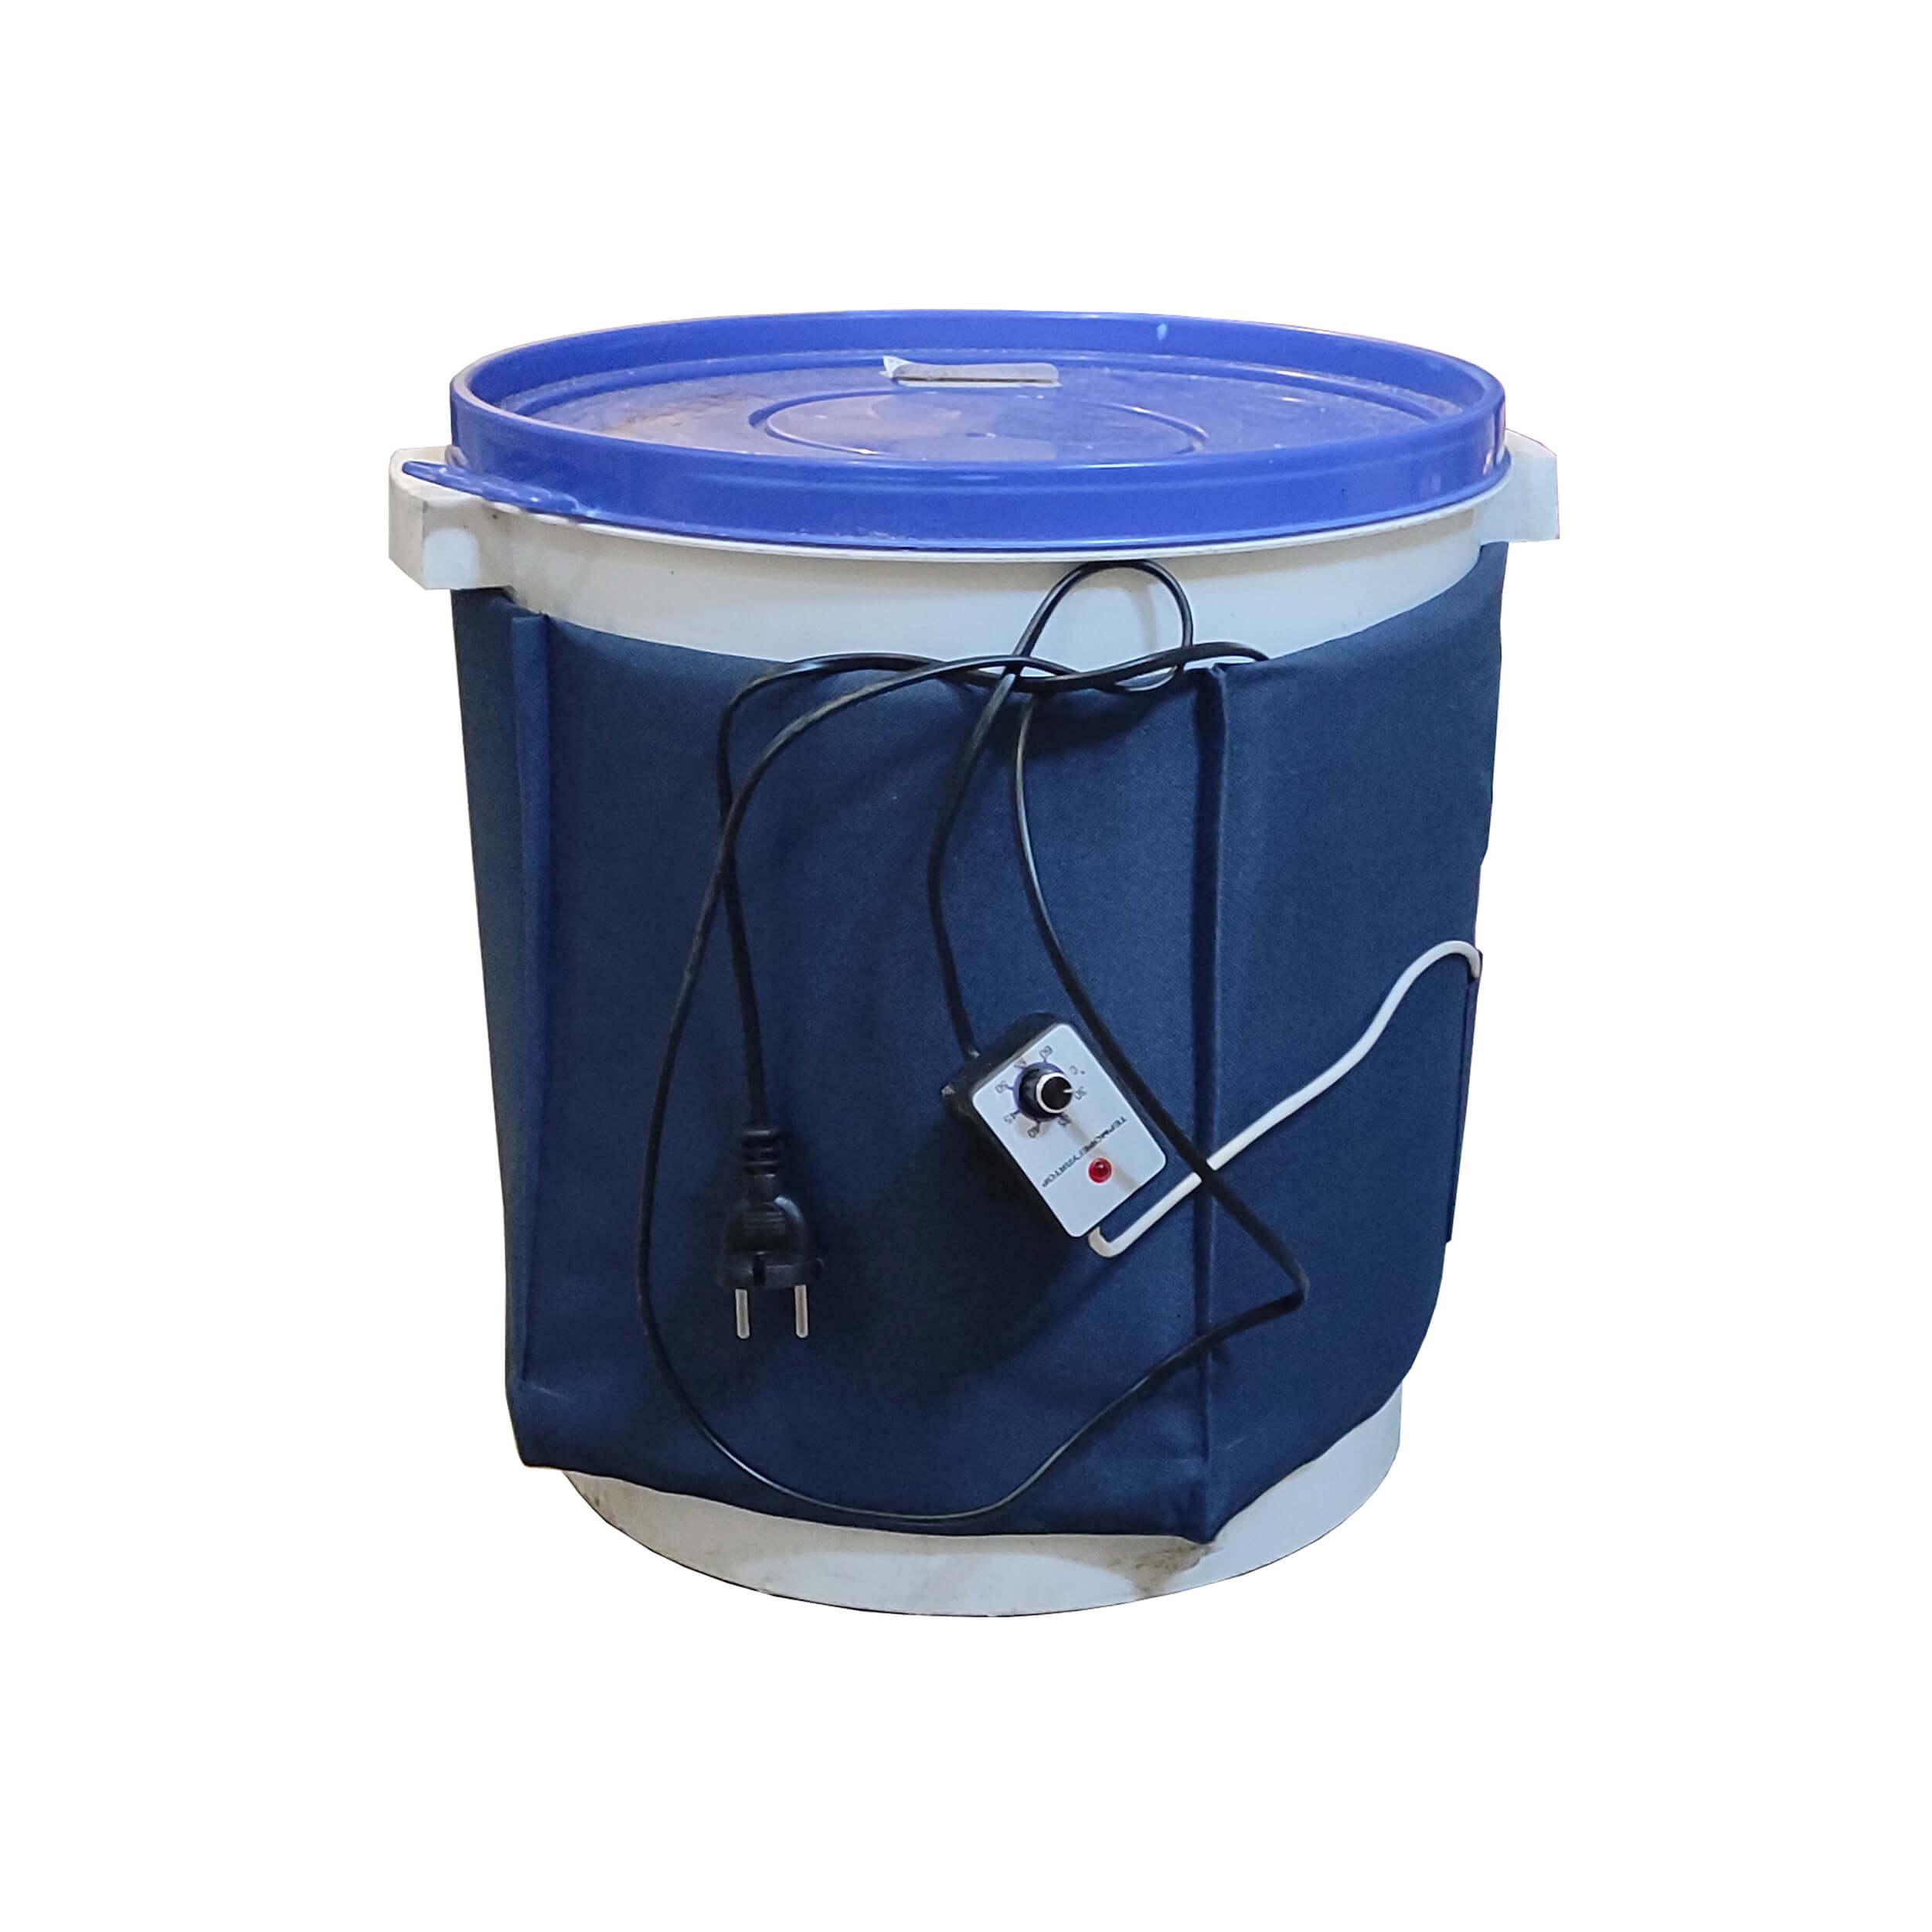 "Декристаллизатор меда на ведро с регулятором температуры ""ДМВ-20-220"" (220B) фото"